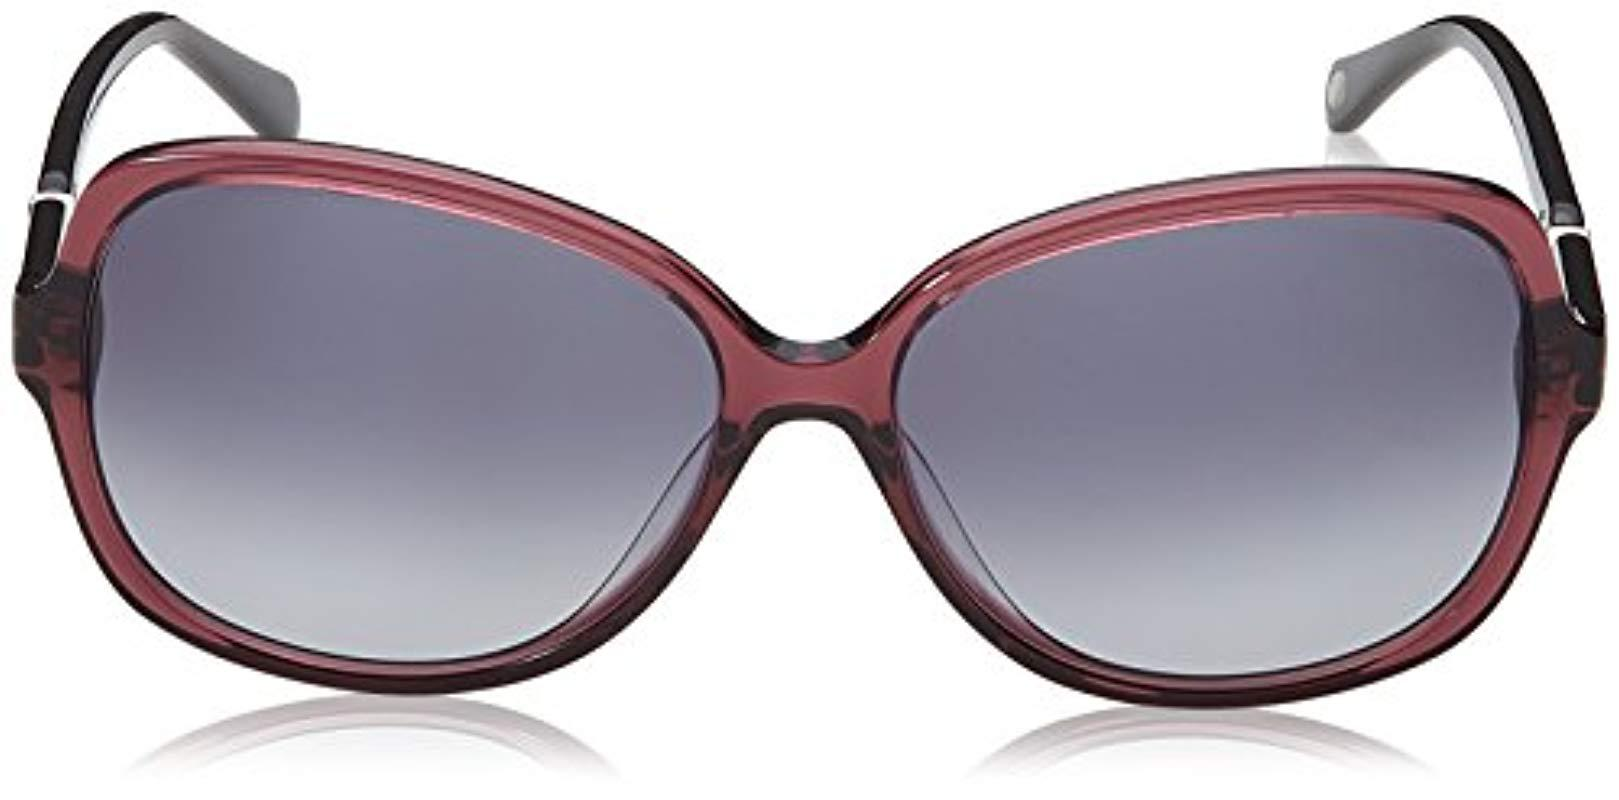 d5fdfd37da Lyst - Fossil Fos 2046 s Rectangular Sunglasses Red Black 59 Mm in ...